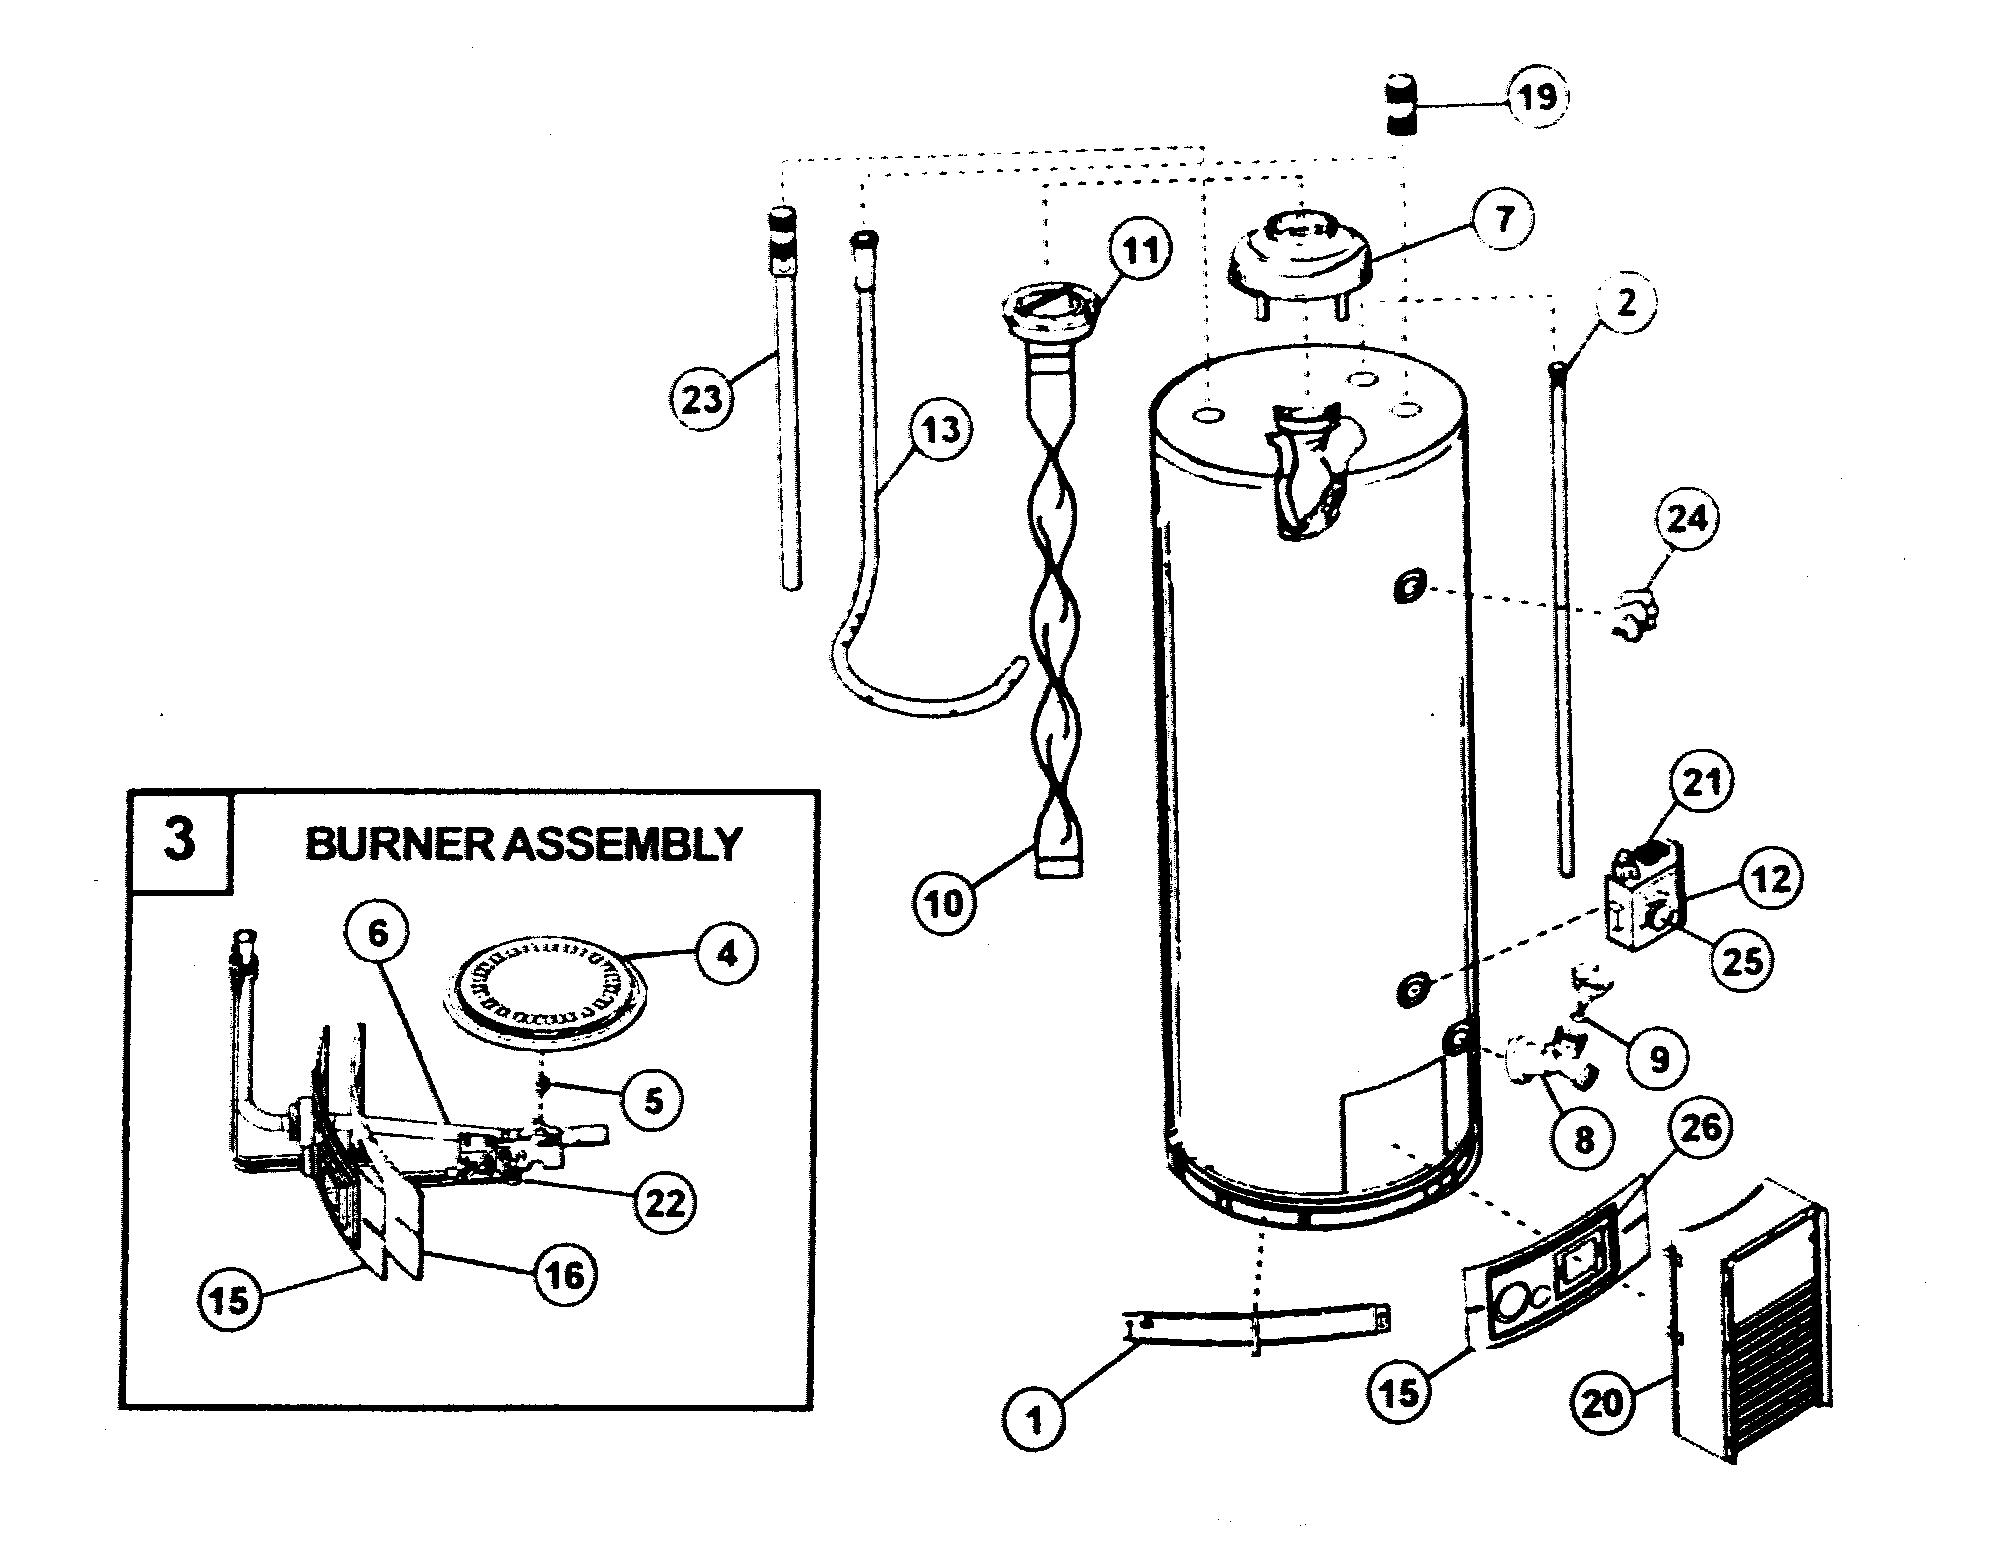 Kenmore model 153331443 water heater, gas genuine parts